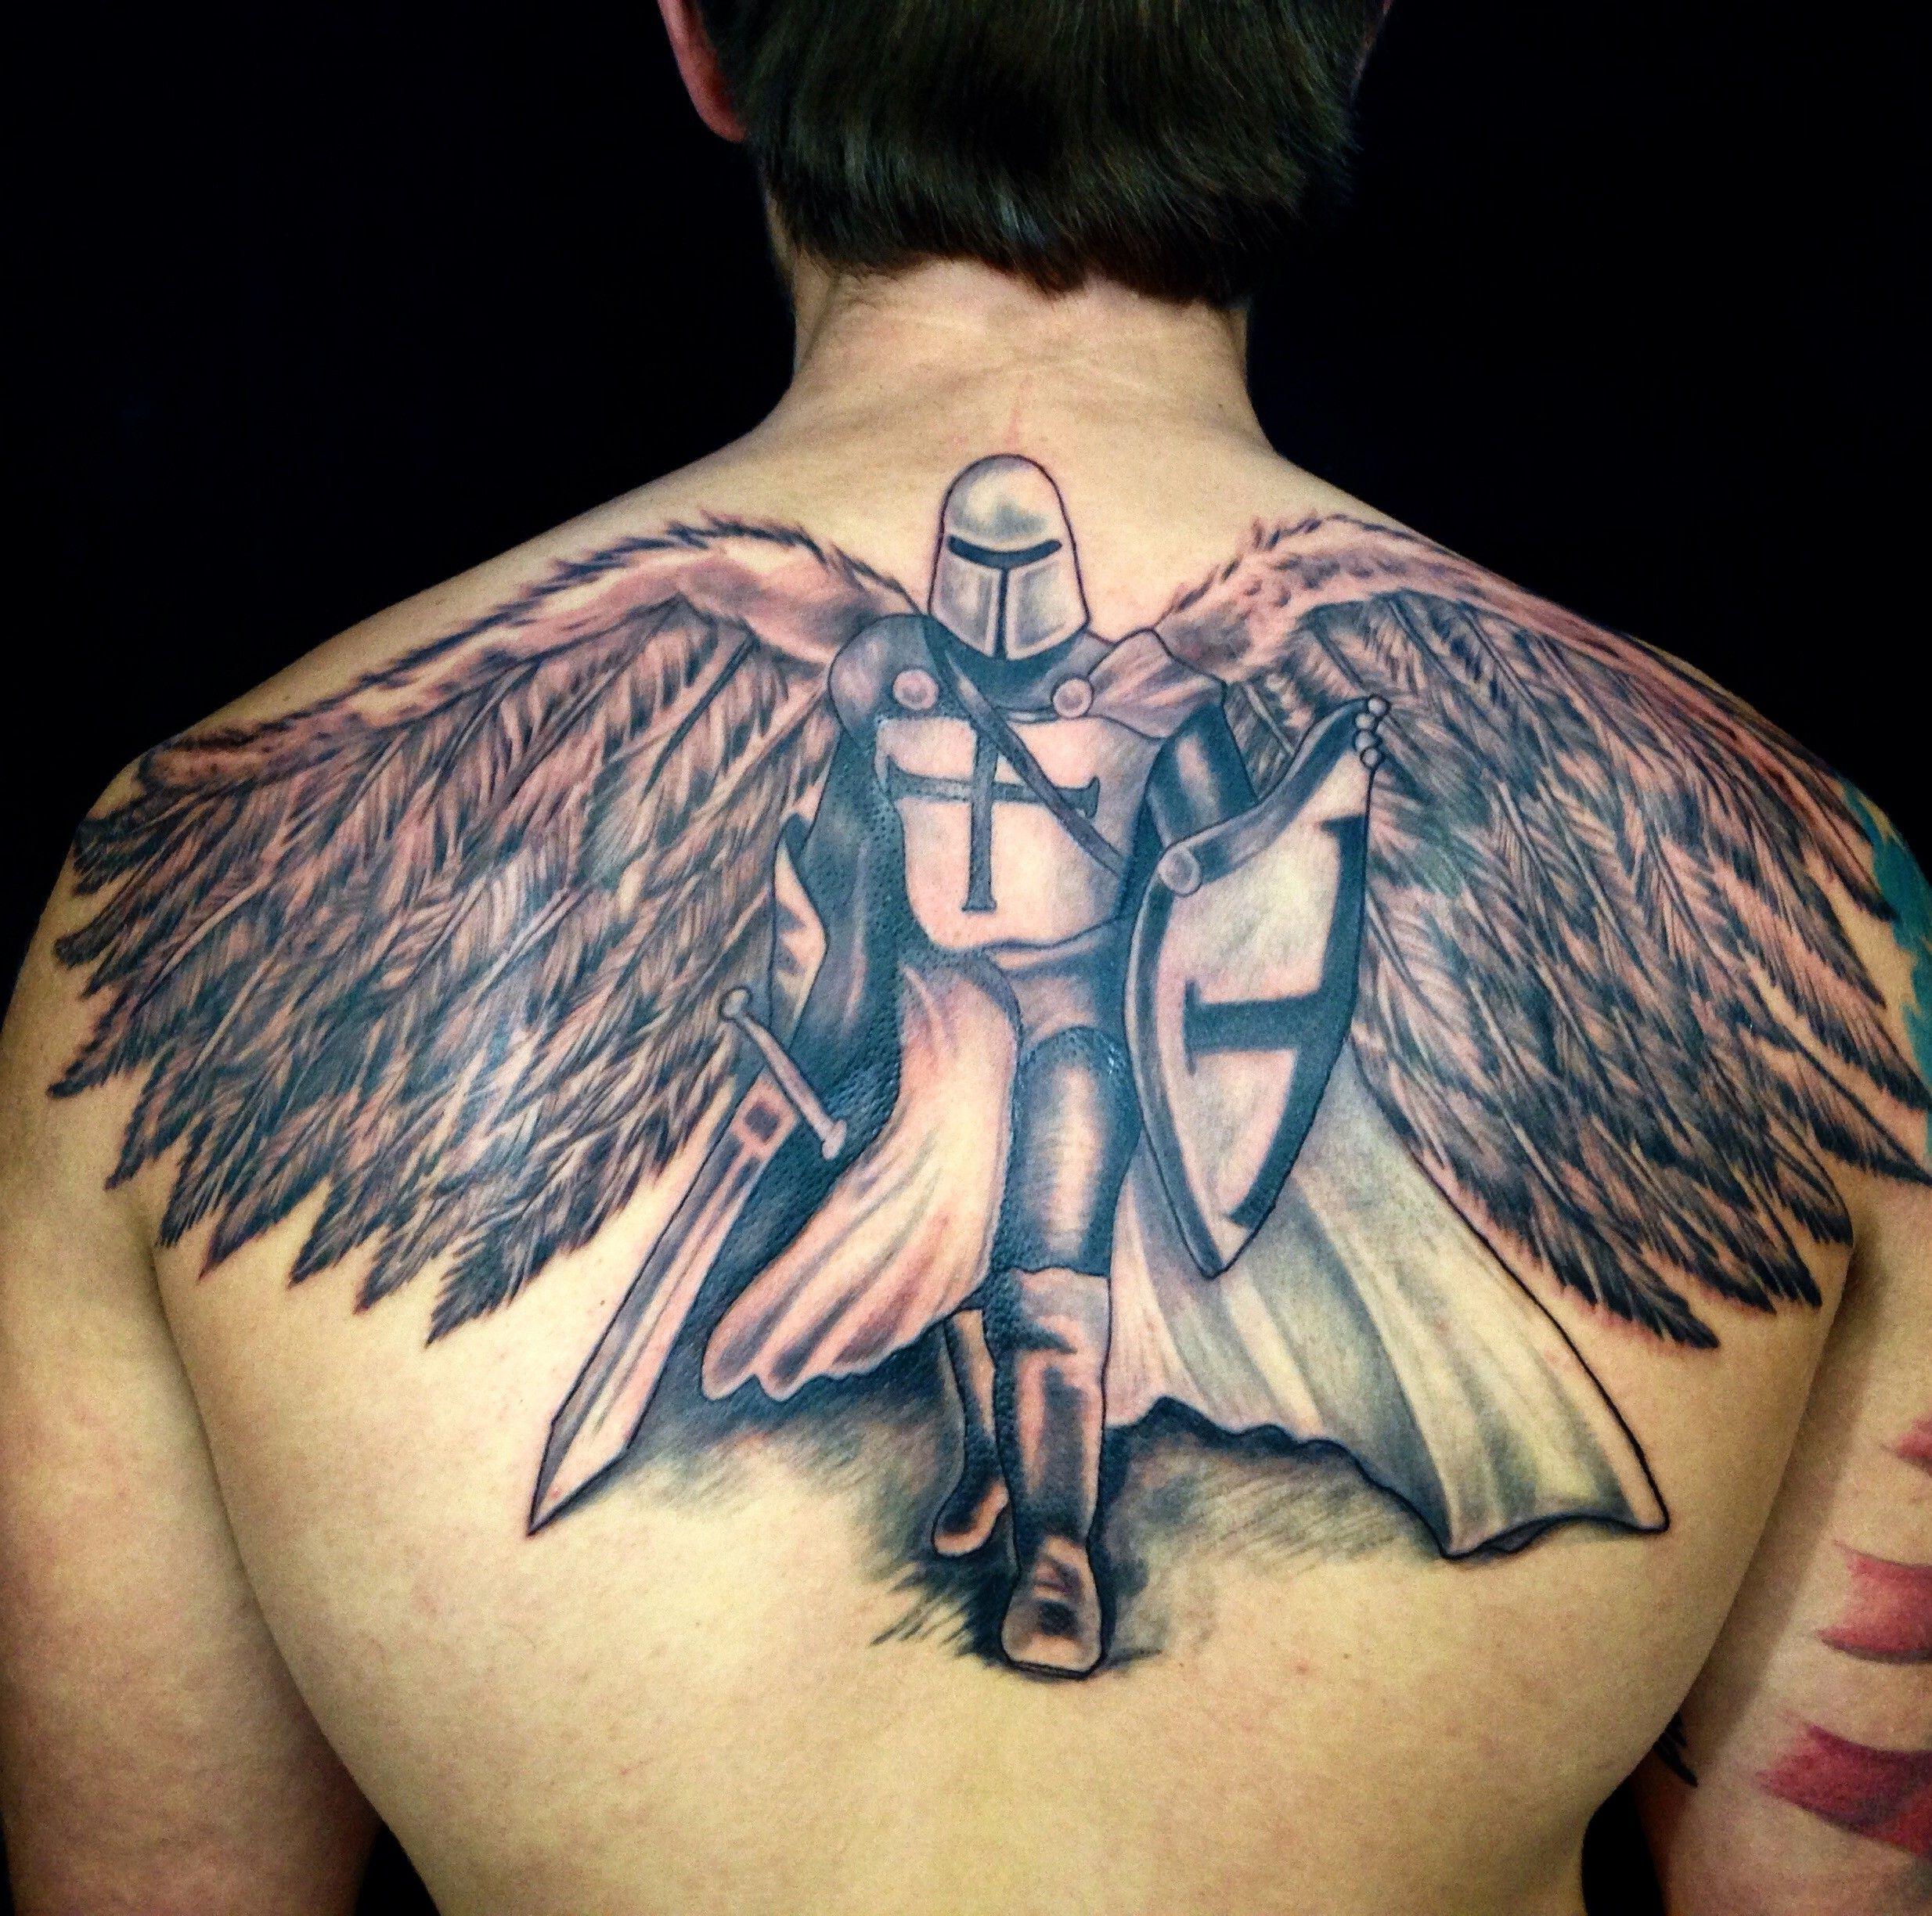 Guardian arch angel tattoo by diane lange at moonlight tattoo seaville nj